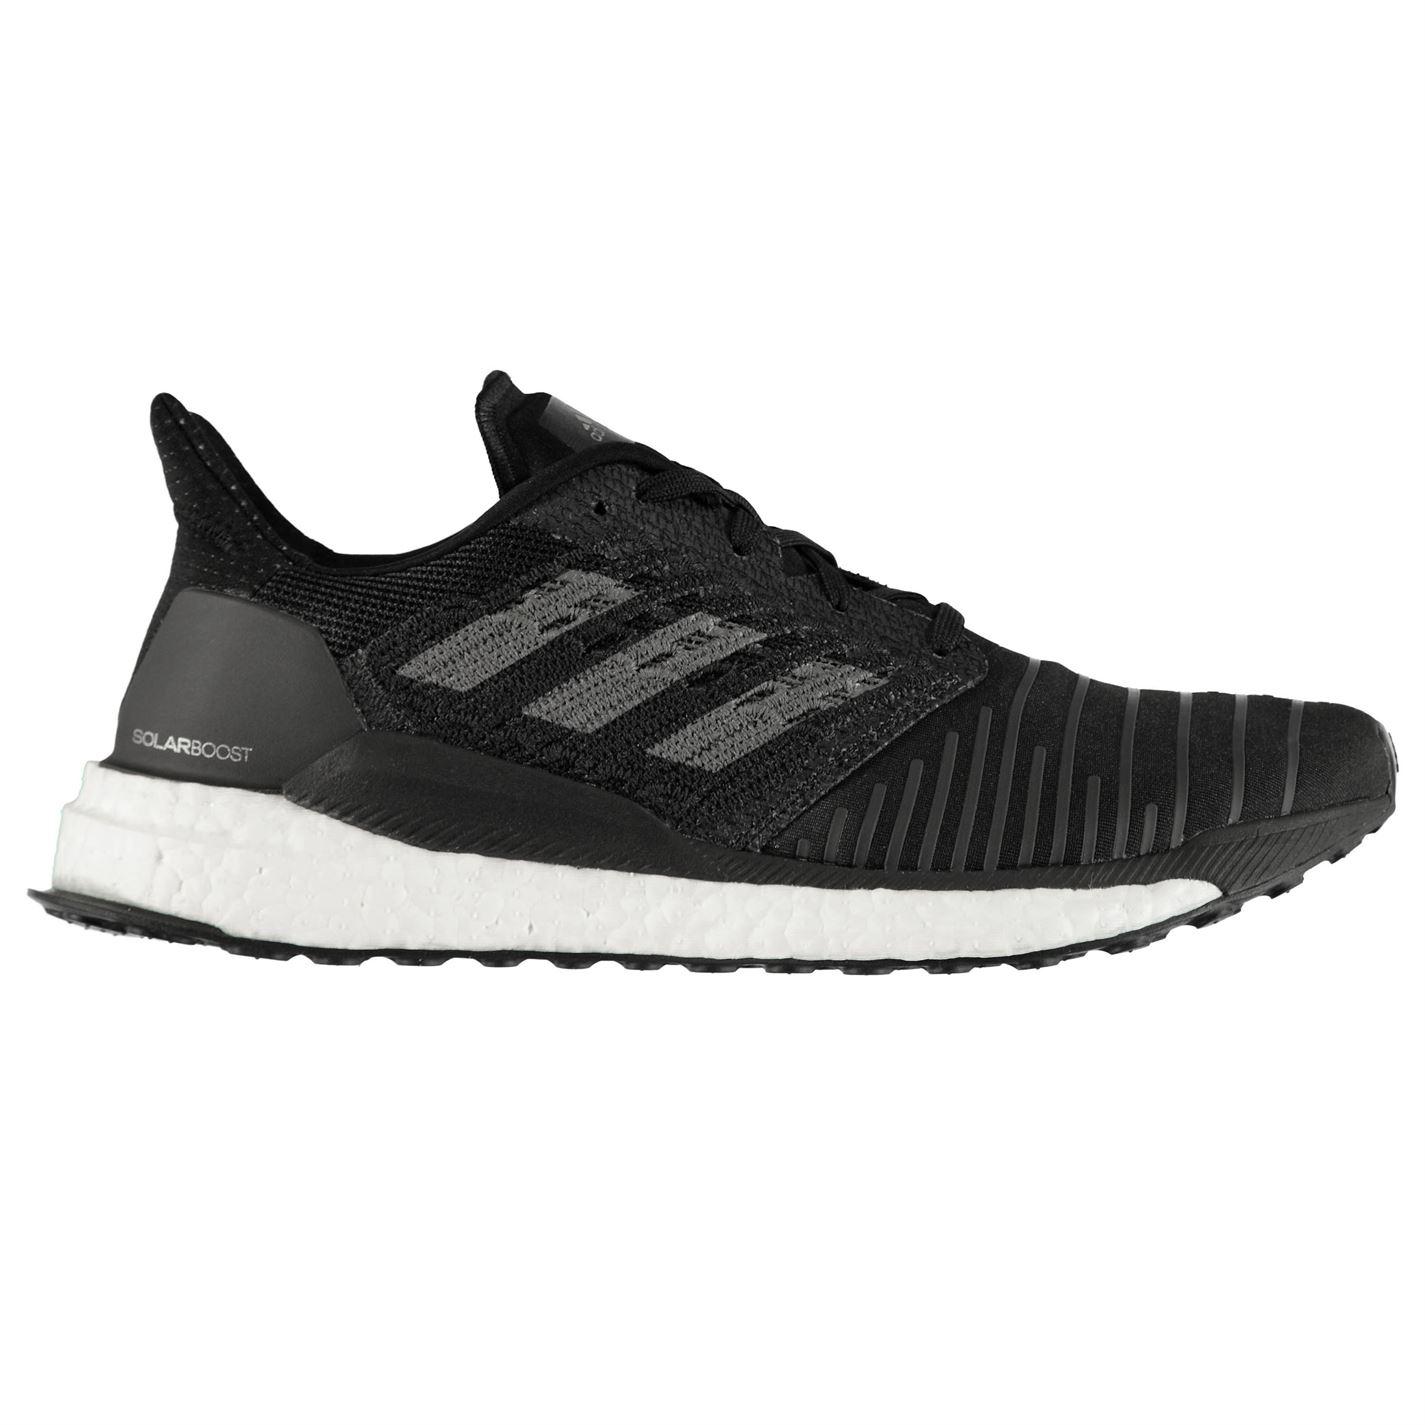 Adidas Solarboost pánske bežecké topánky